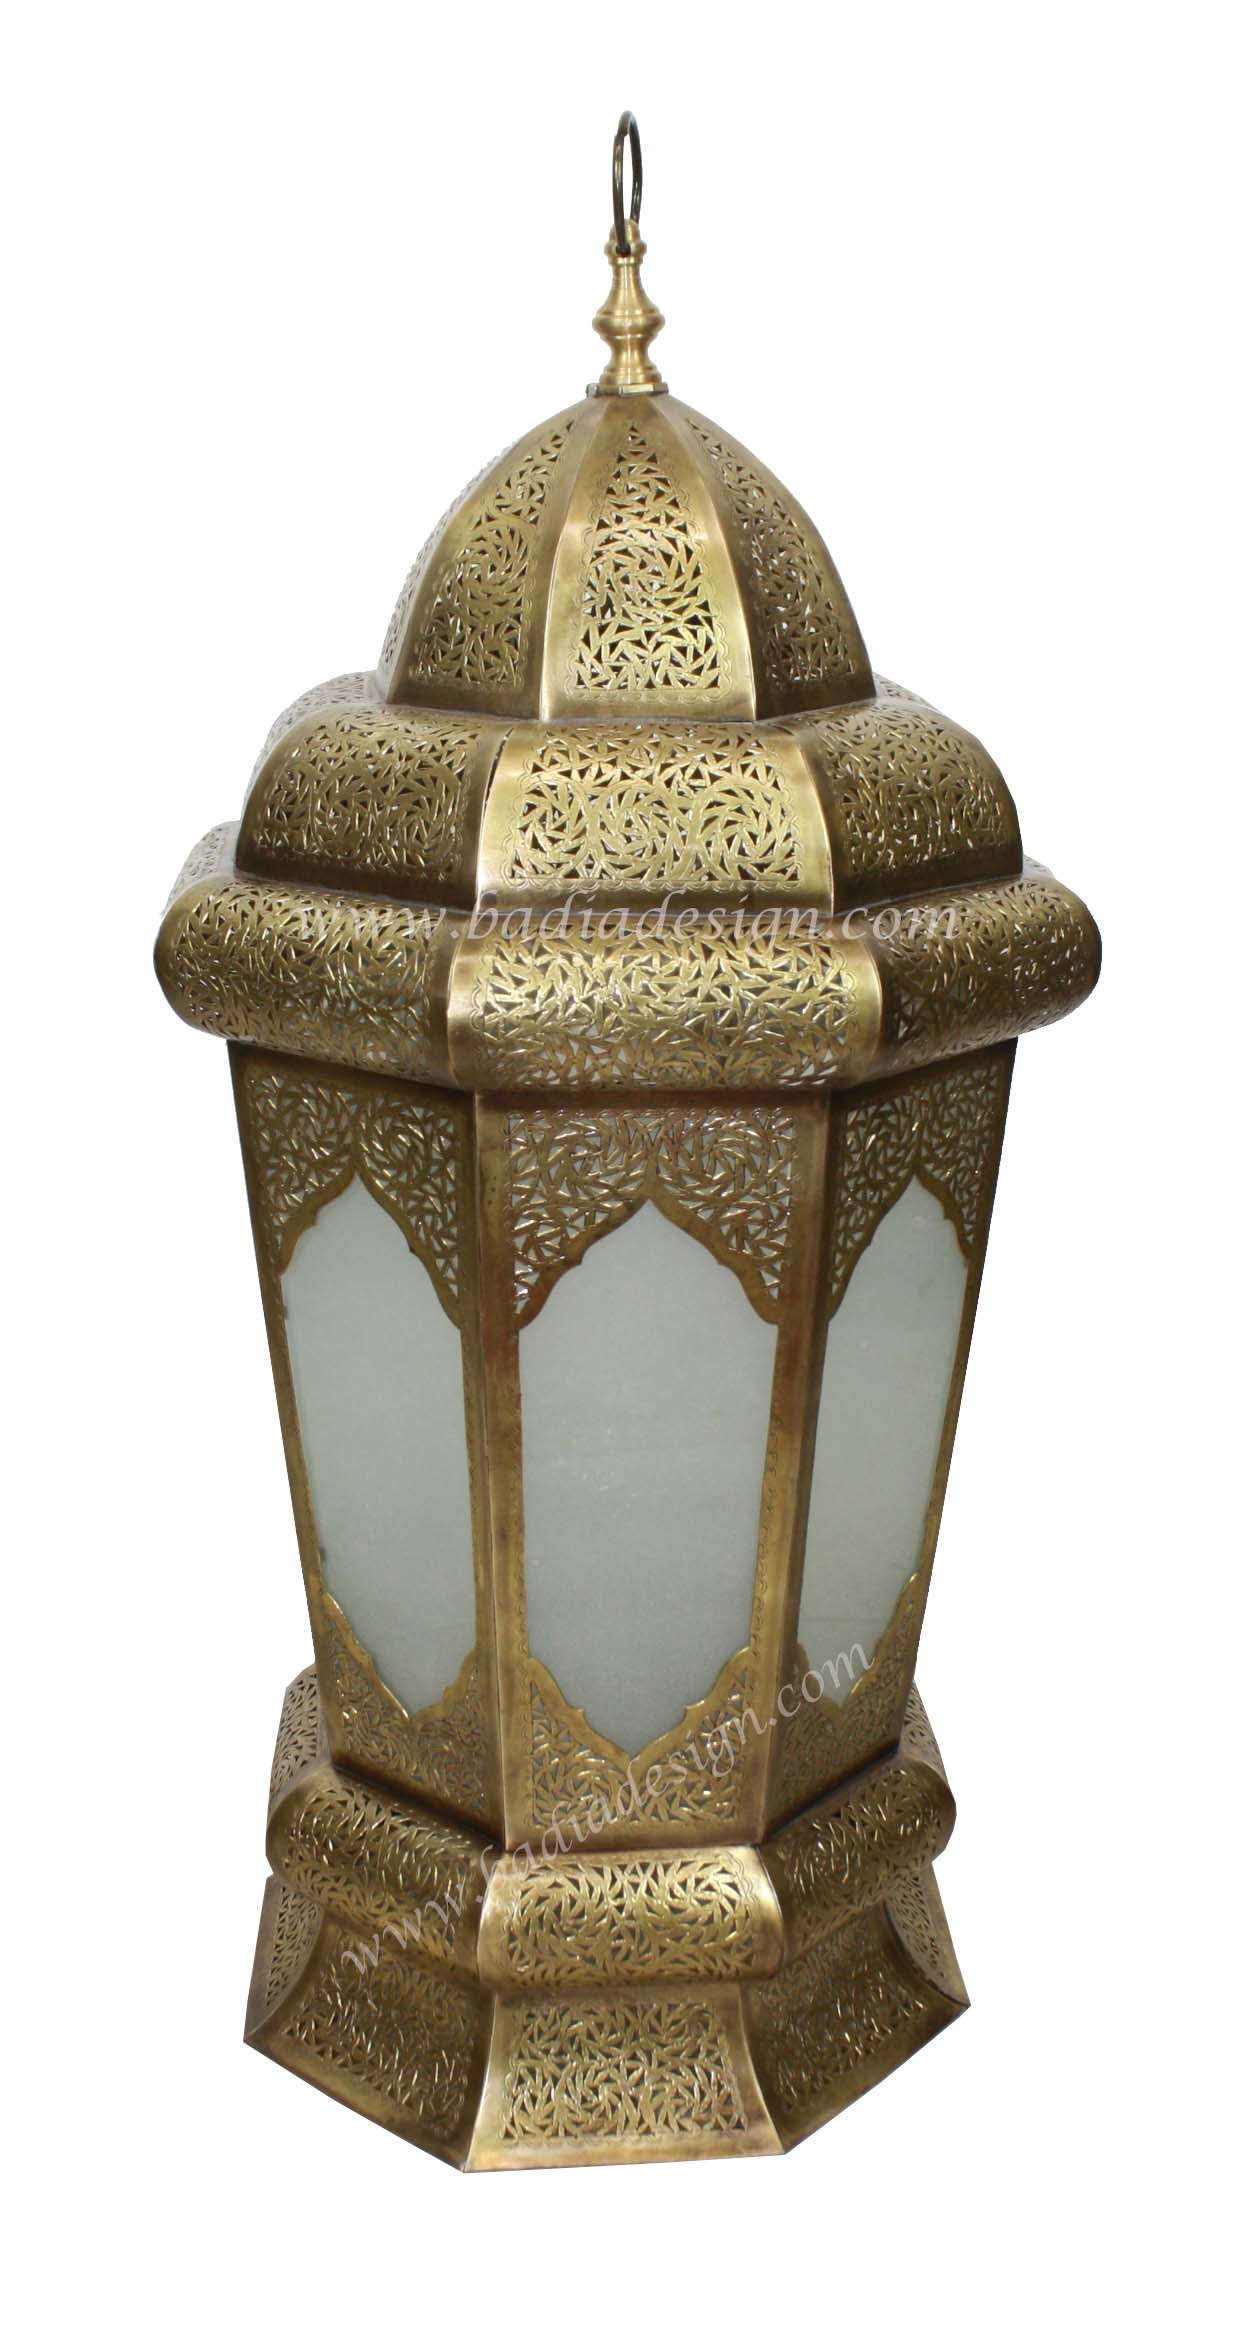 large-moroccan-floor-brass-lantern-lig251-1.jpg